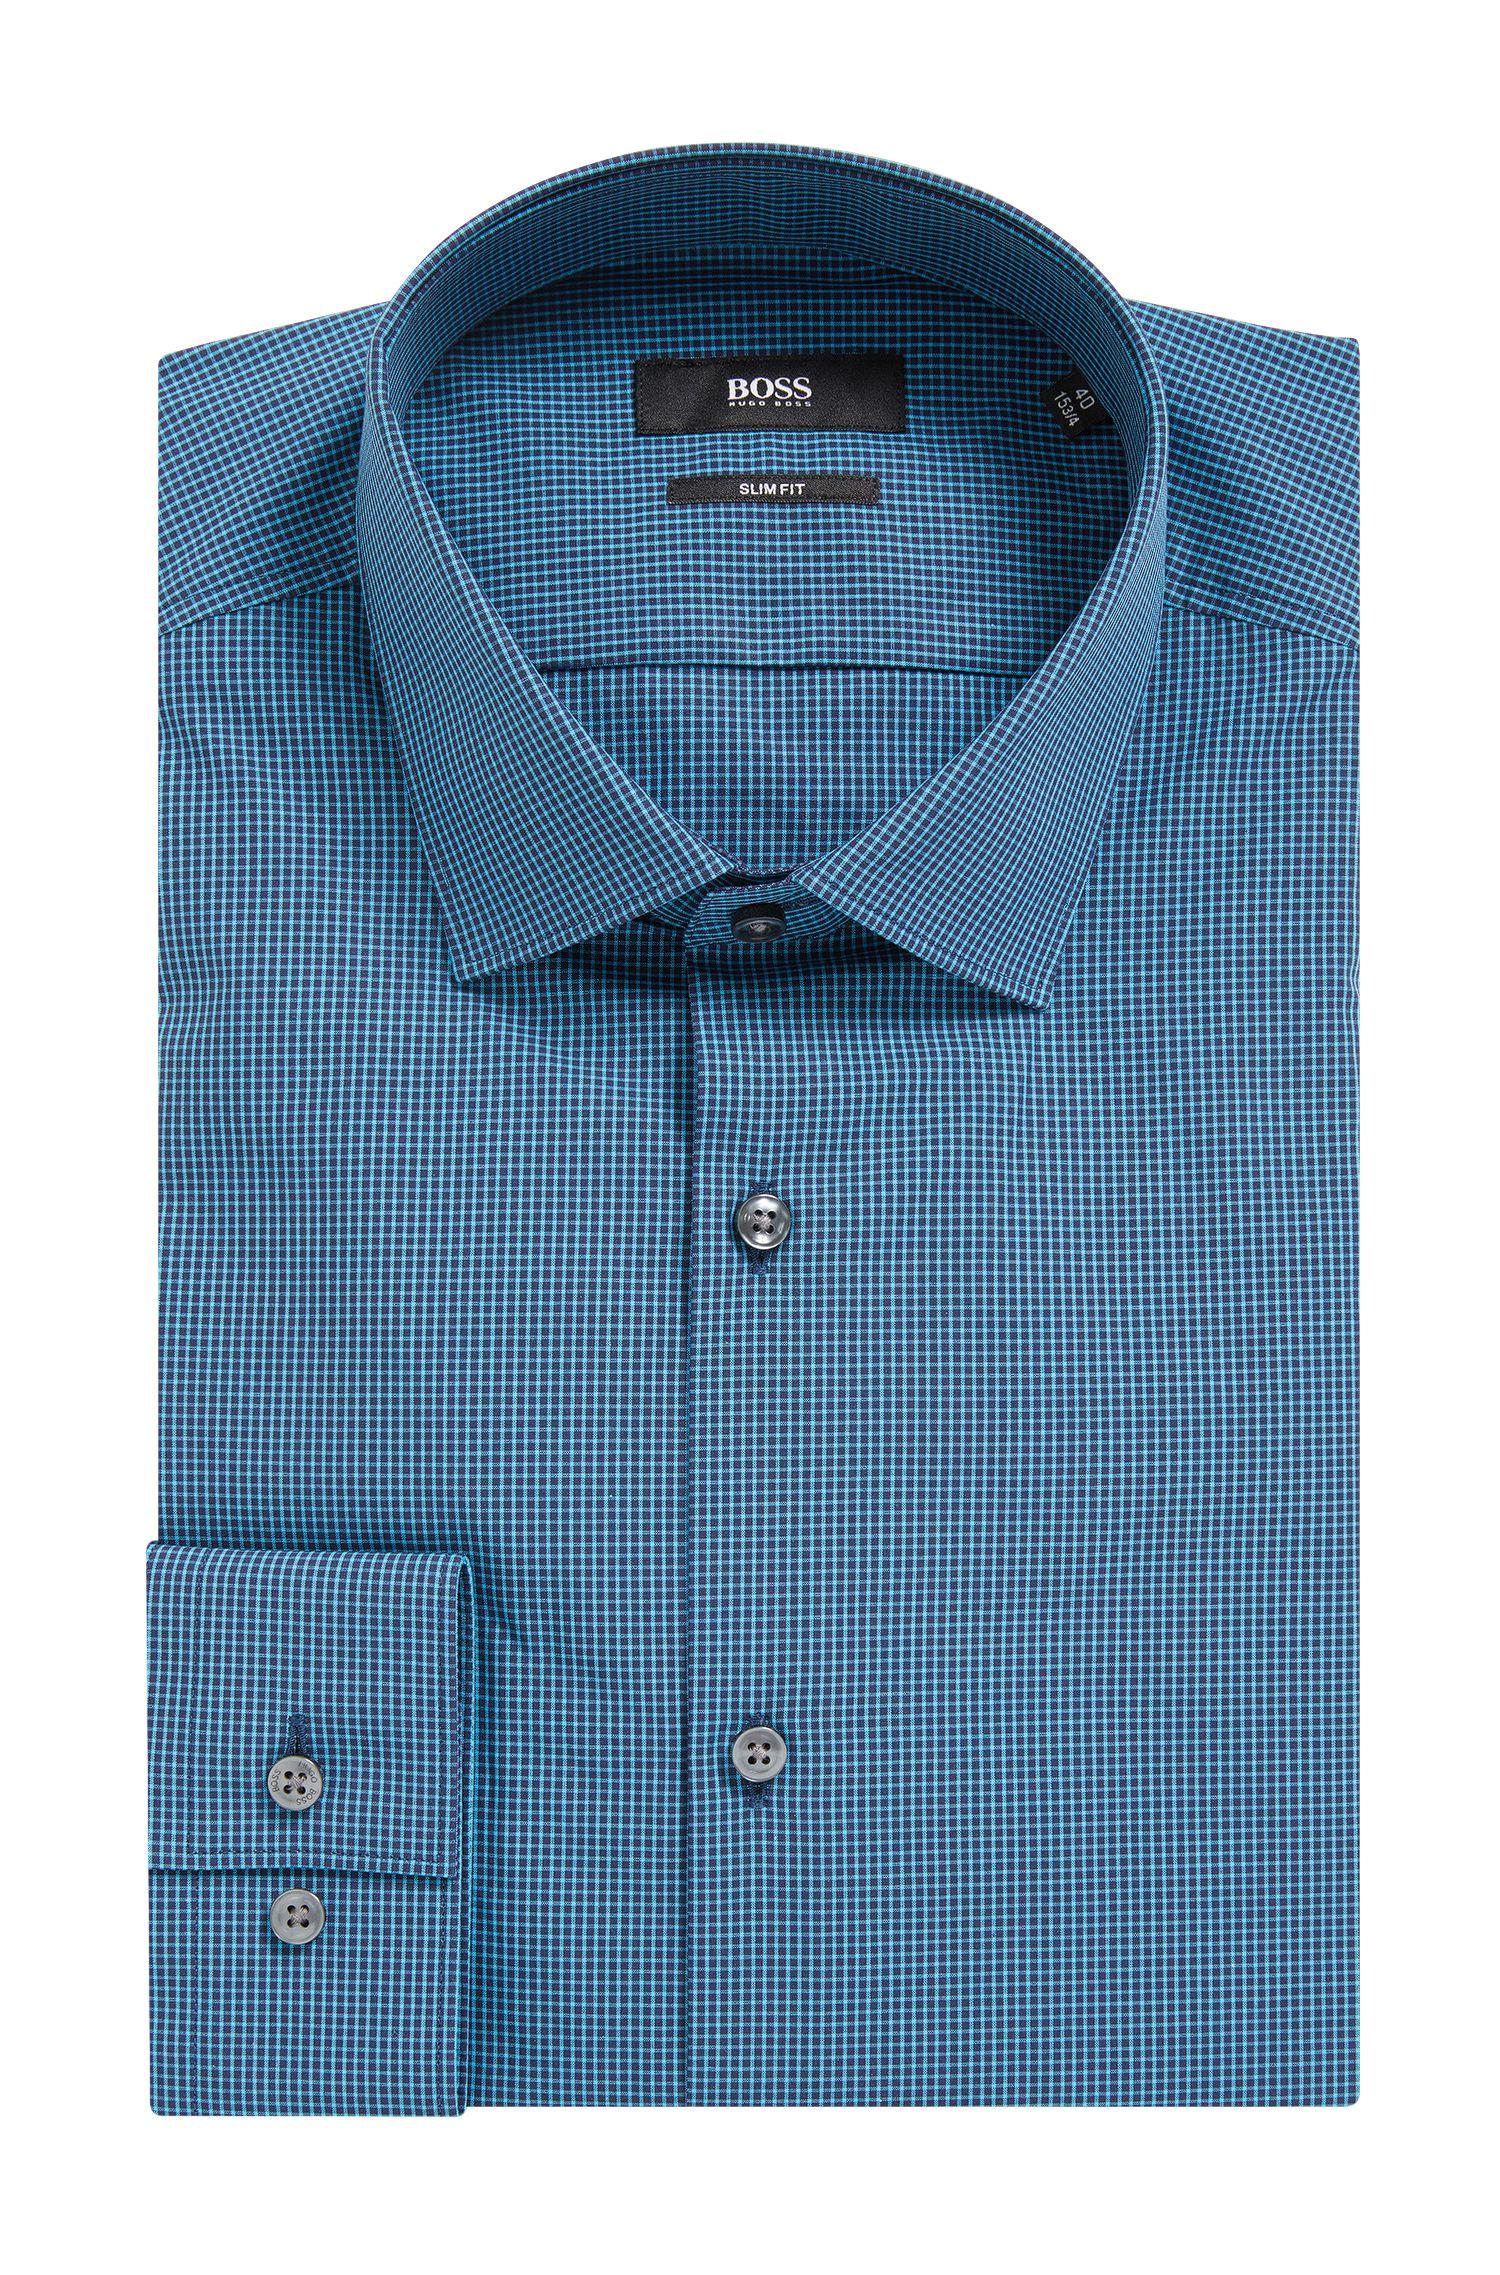 Micro Gingham Cotton Dress Shirt, Slim Fit | Ismo